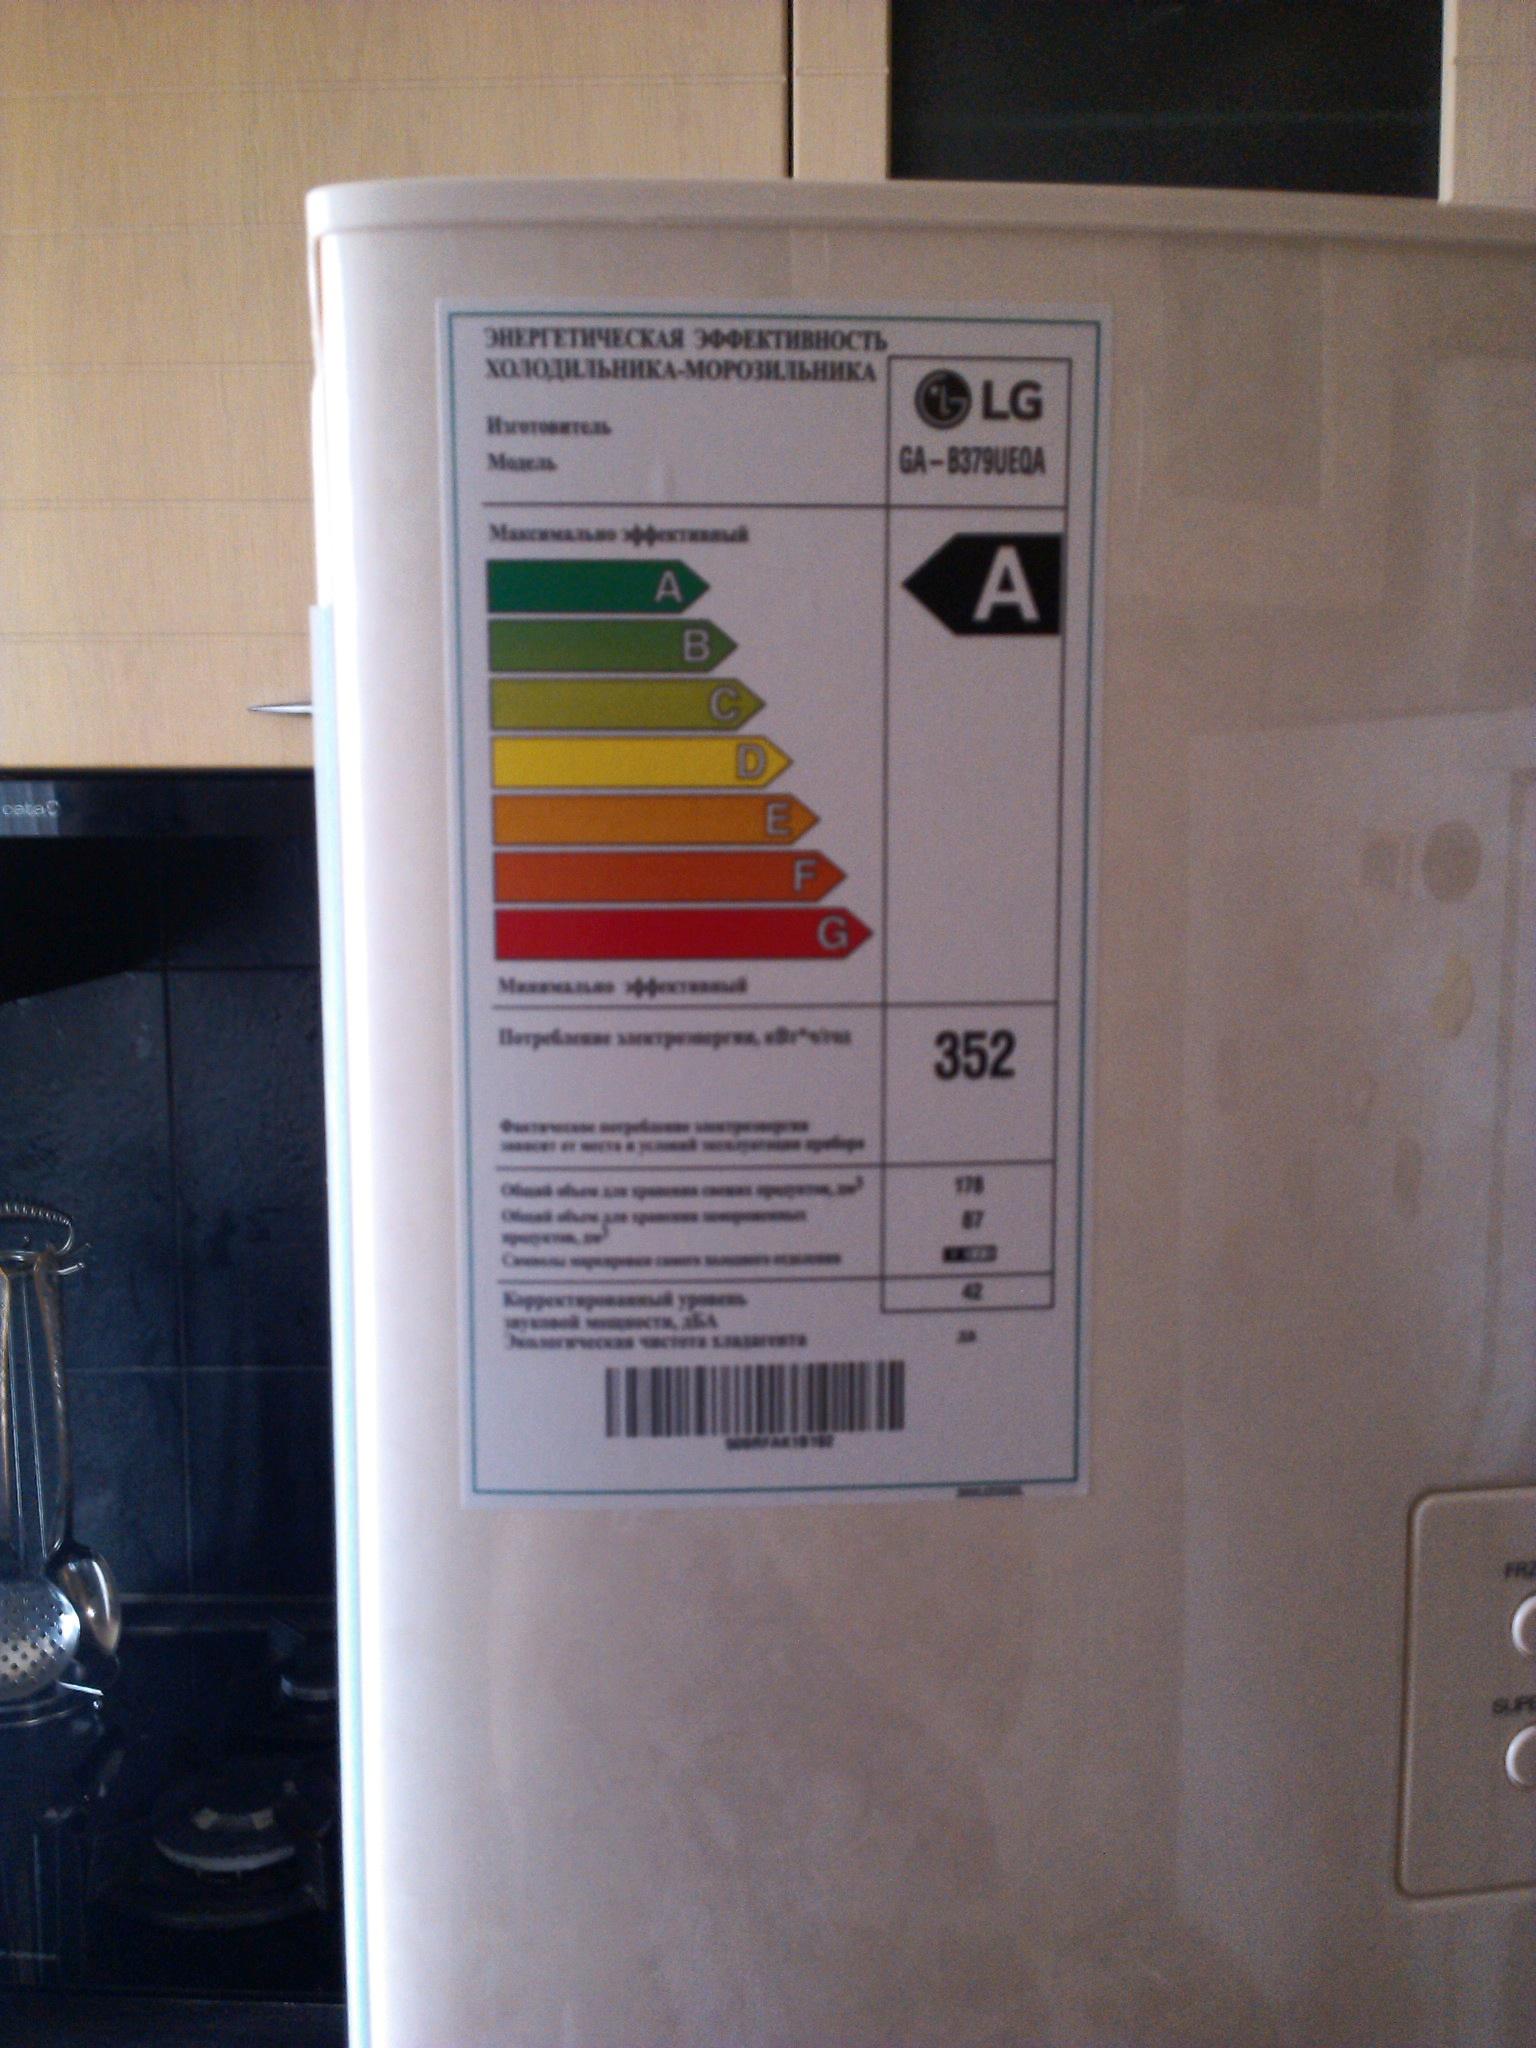 обзор от покупателя на холодильник Lg Ga B379ueqa интернет магазин